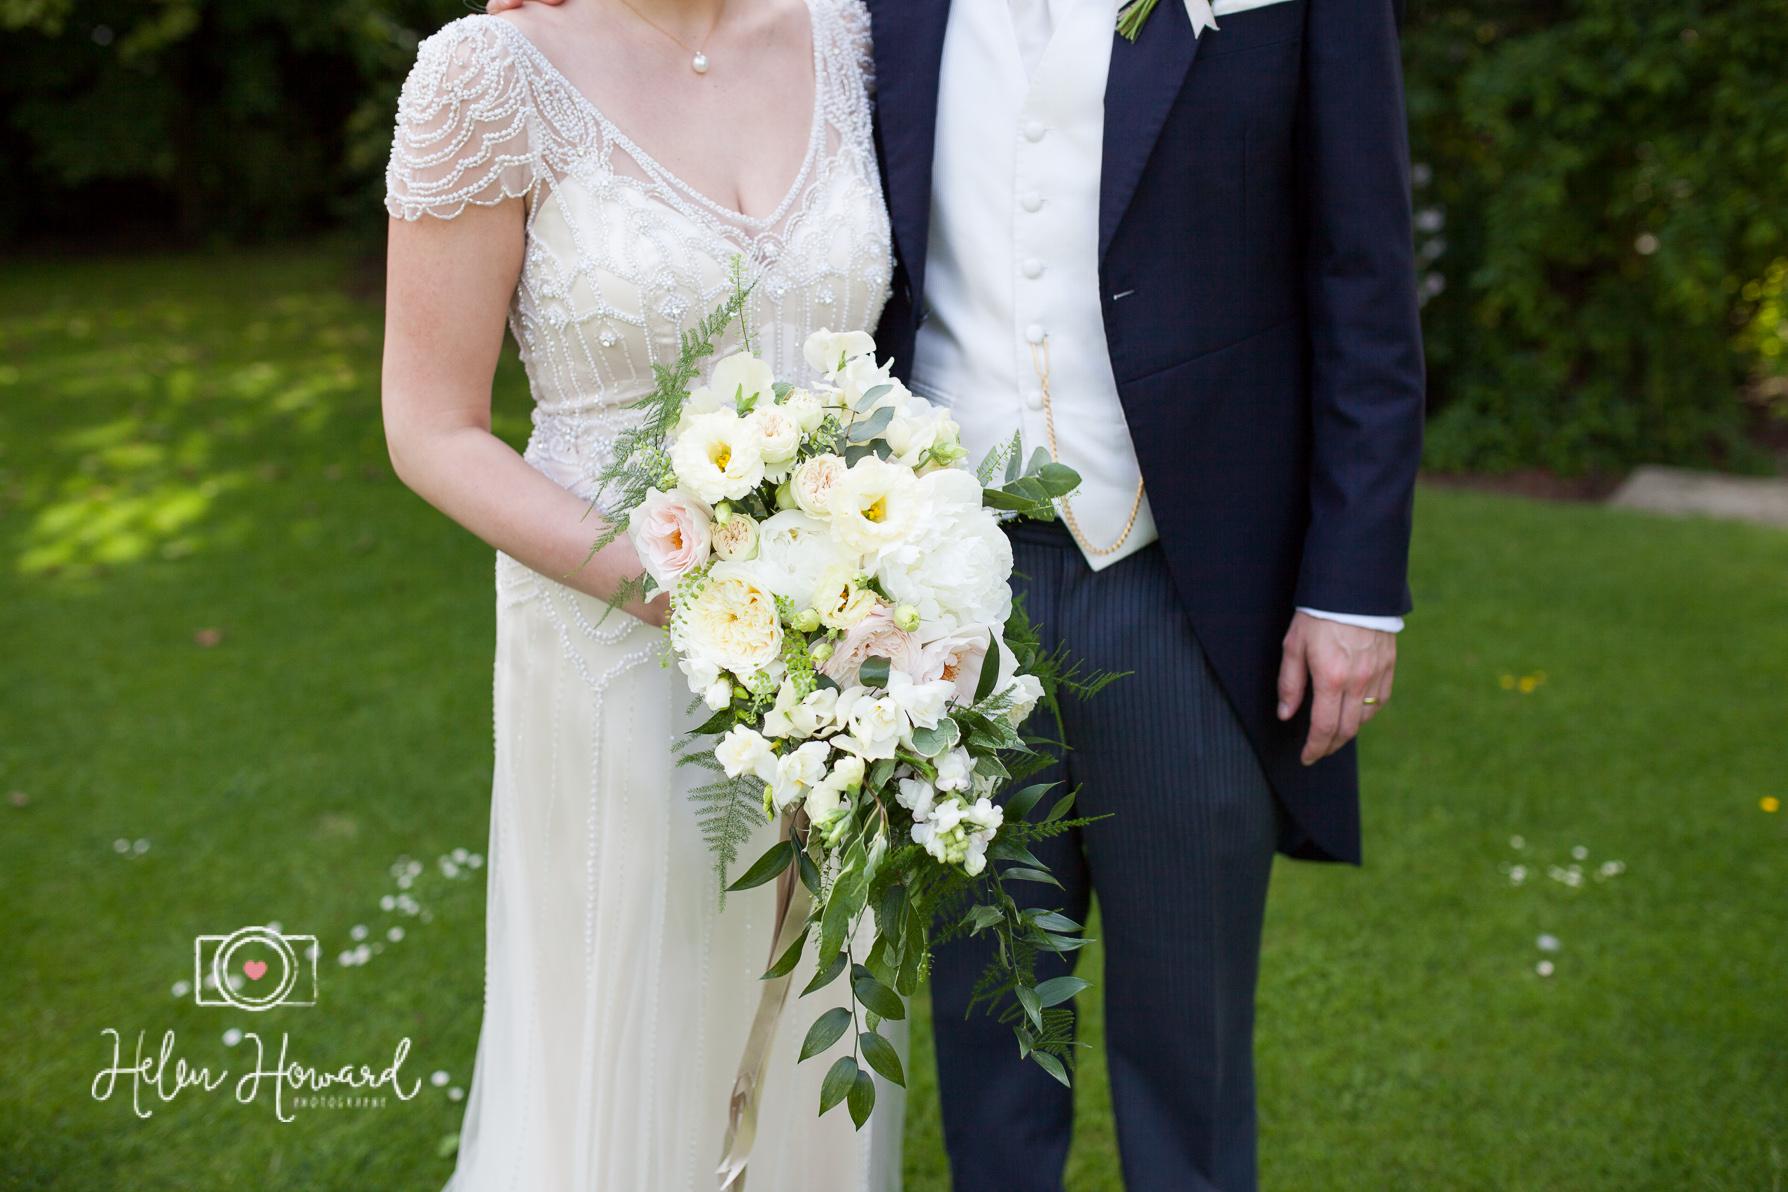 Helen Howard Photography Packington Moor Wedding-83.jpg